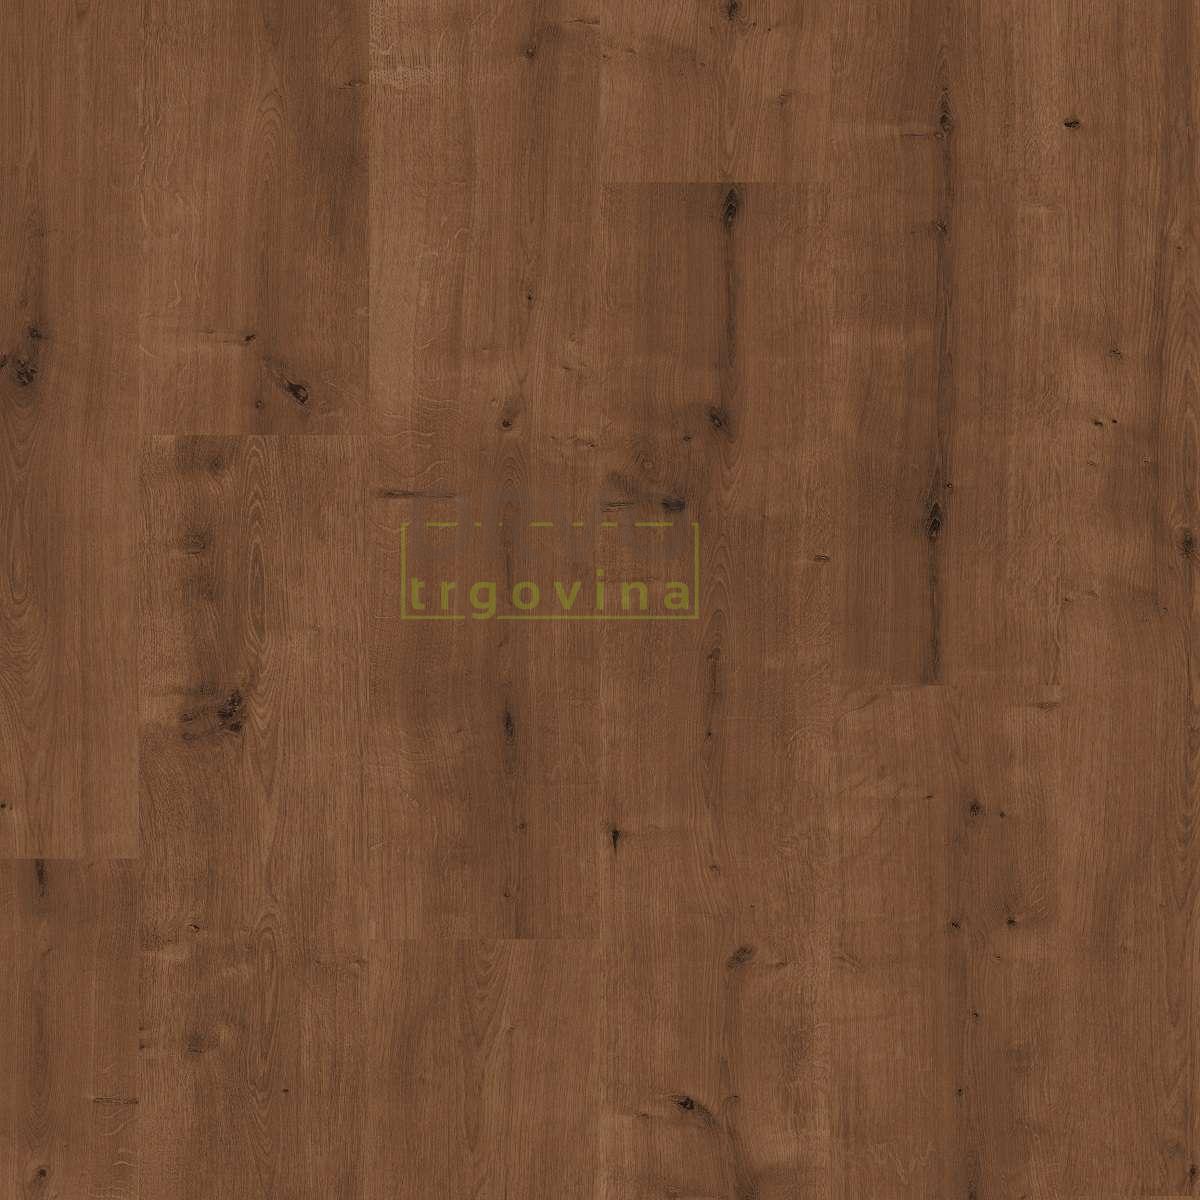 LAMINAT  7mm/Kl.32 LOC 440x HRAST GINGER p=2,421 / 4578